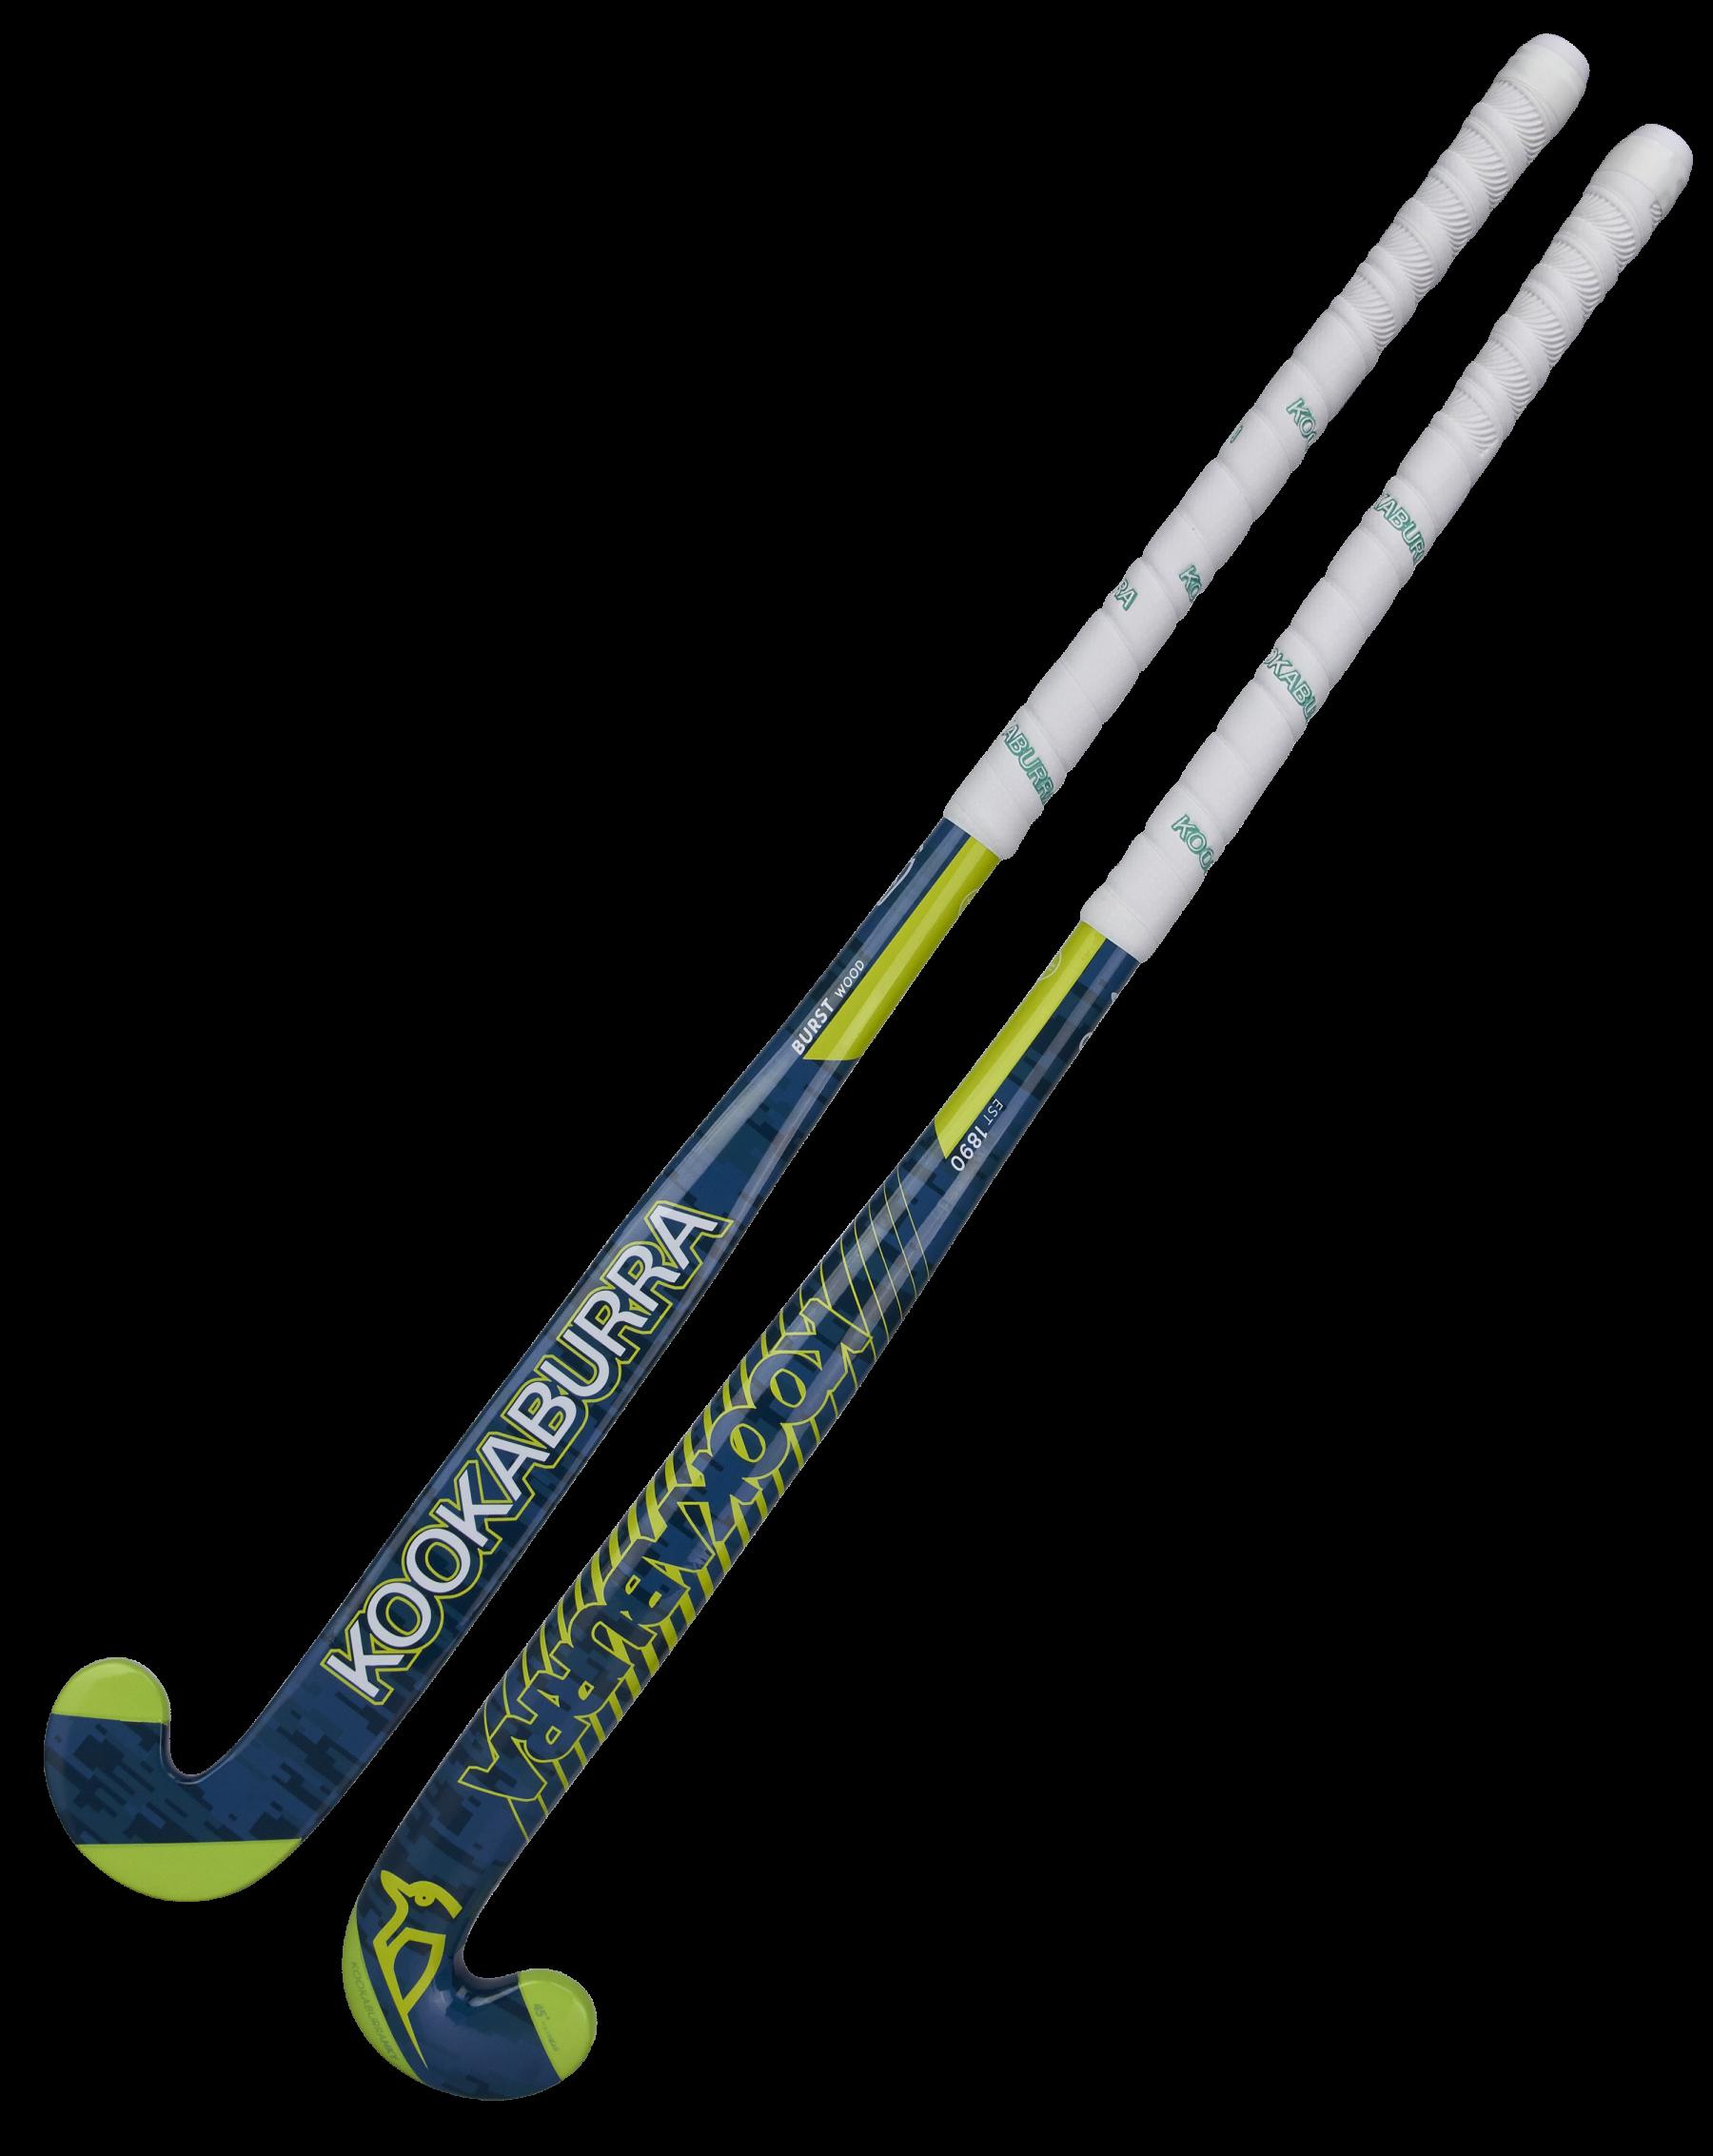 1800x2265 Kookaburra Burst Wooden Hockey Stick